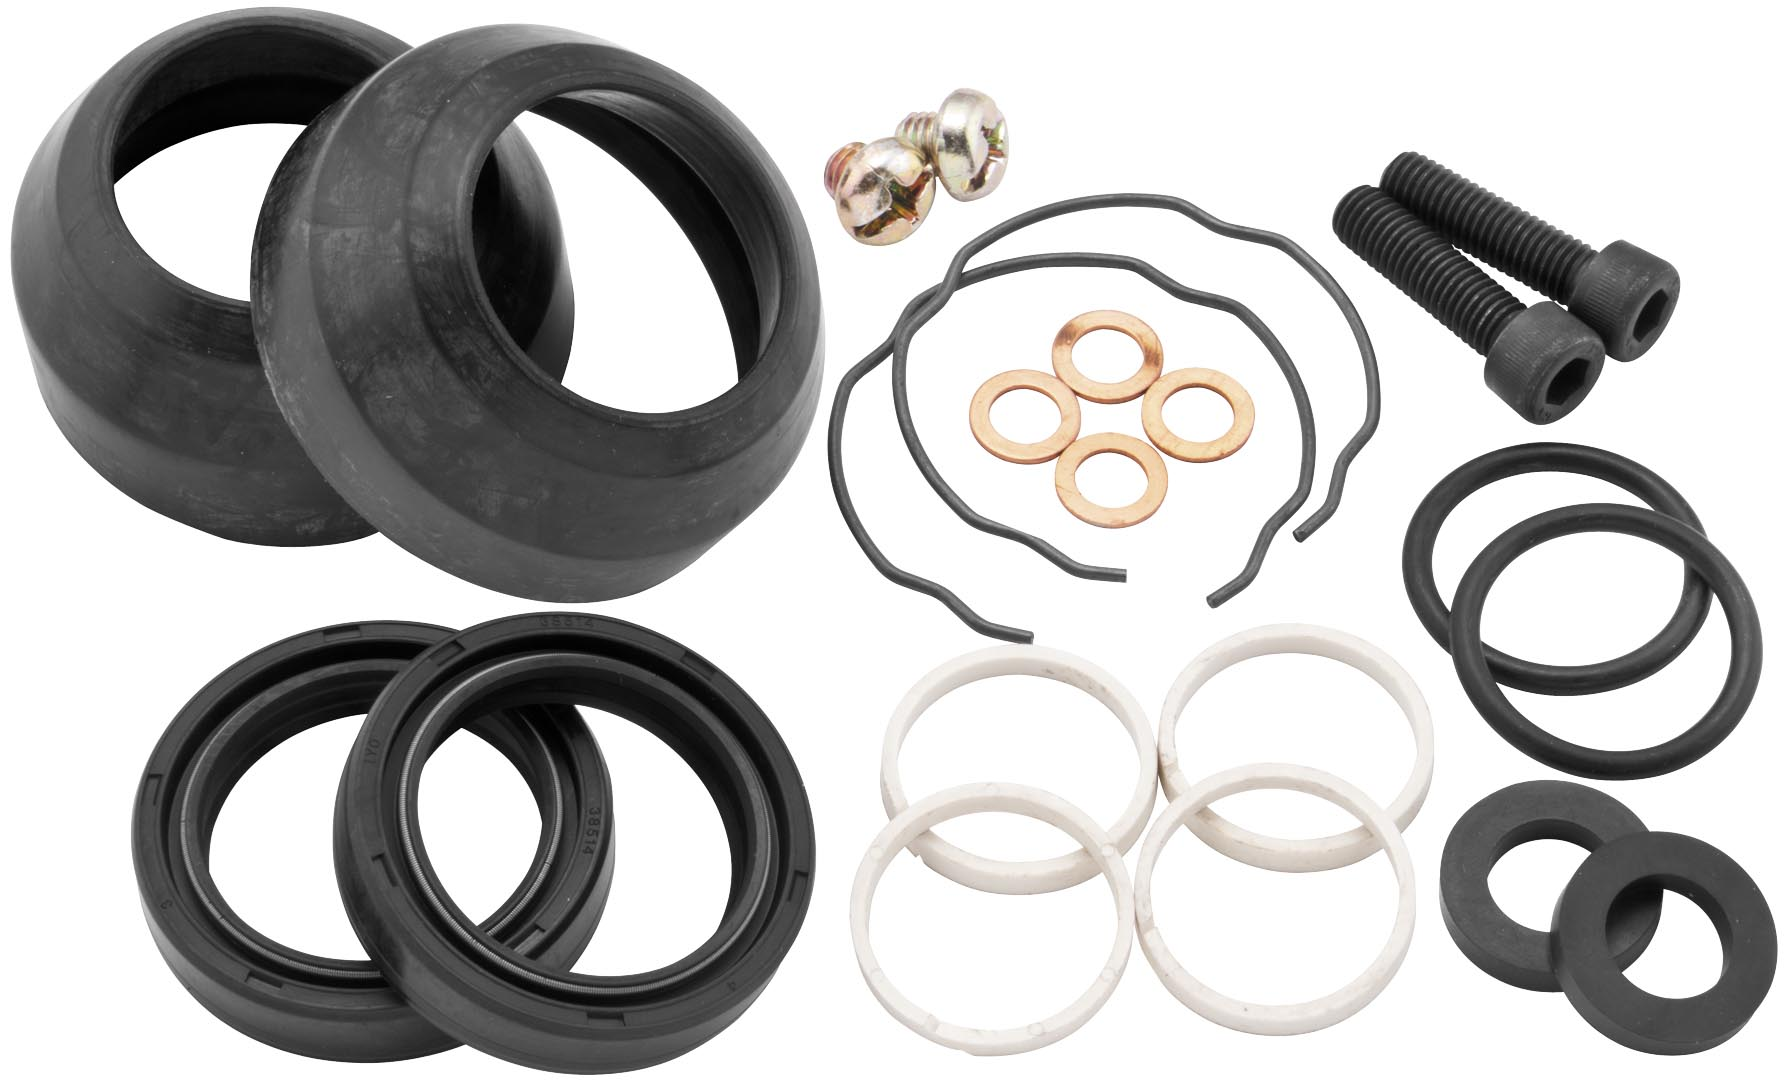 Details about Biker's Choice MT62142 Fork Seal Kit 41mm